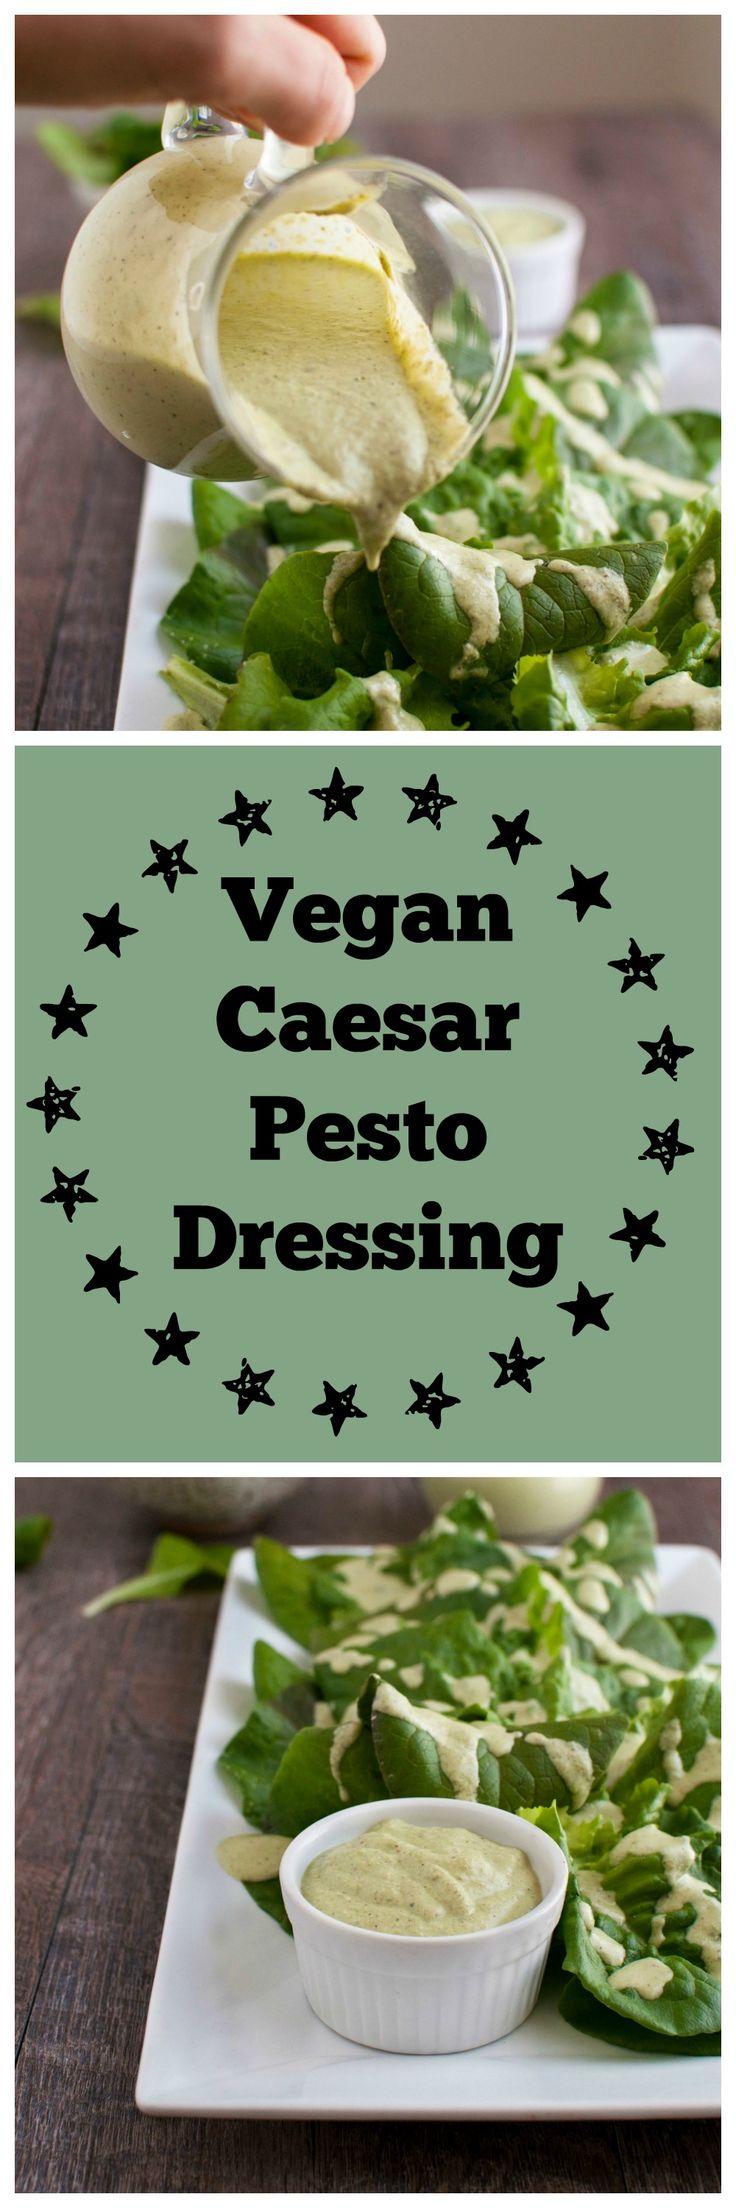 vegan caesar pesto dressing made with clean ingredients.